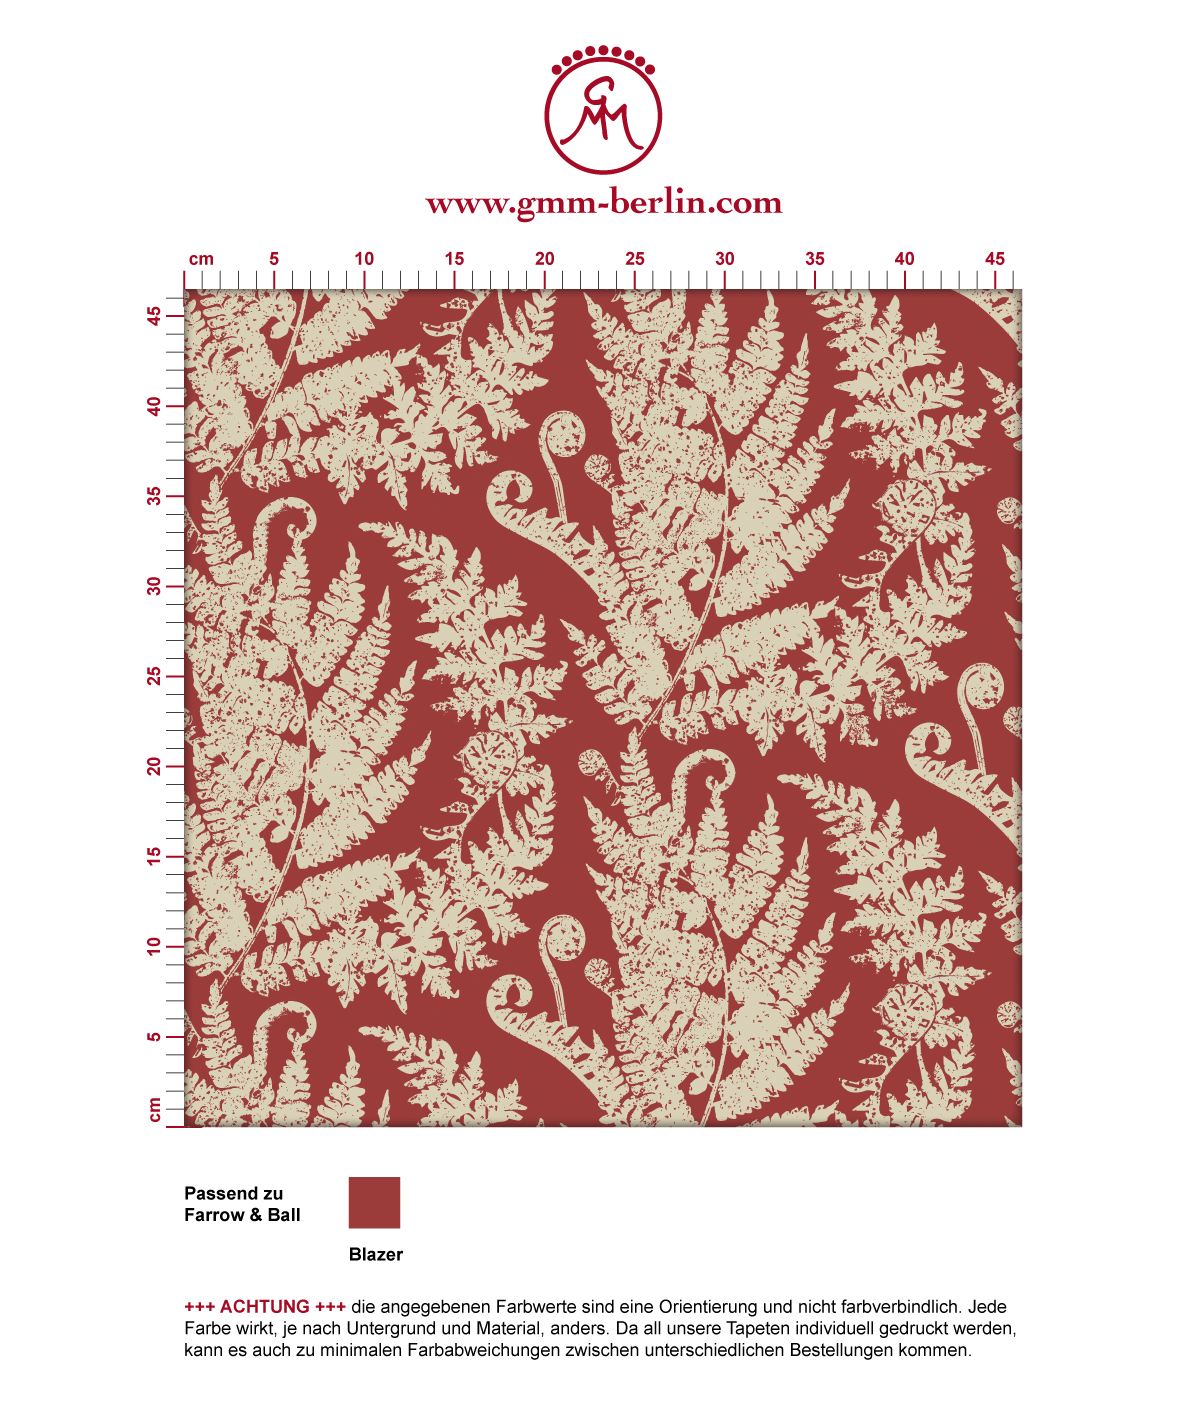 "Schöne Tapete ""Heidis Fernerie"" mit großem Farn Muster in rot angepasst an Farrow & Ball Wandfarben 3"